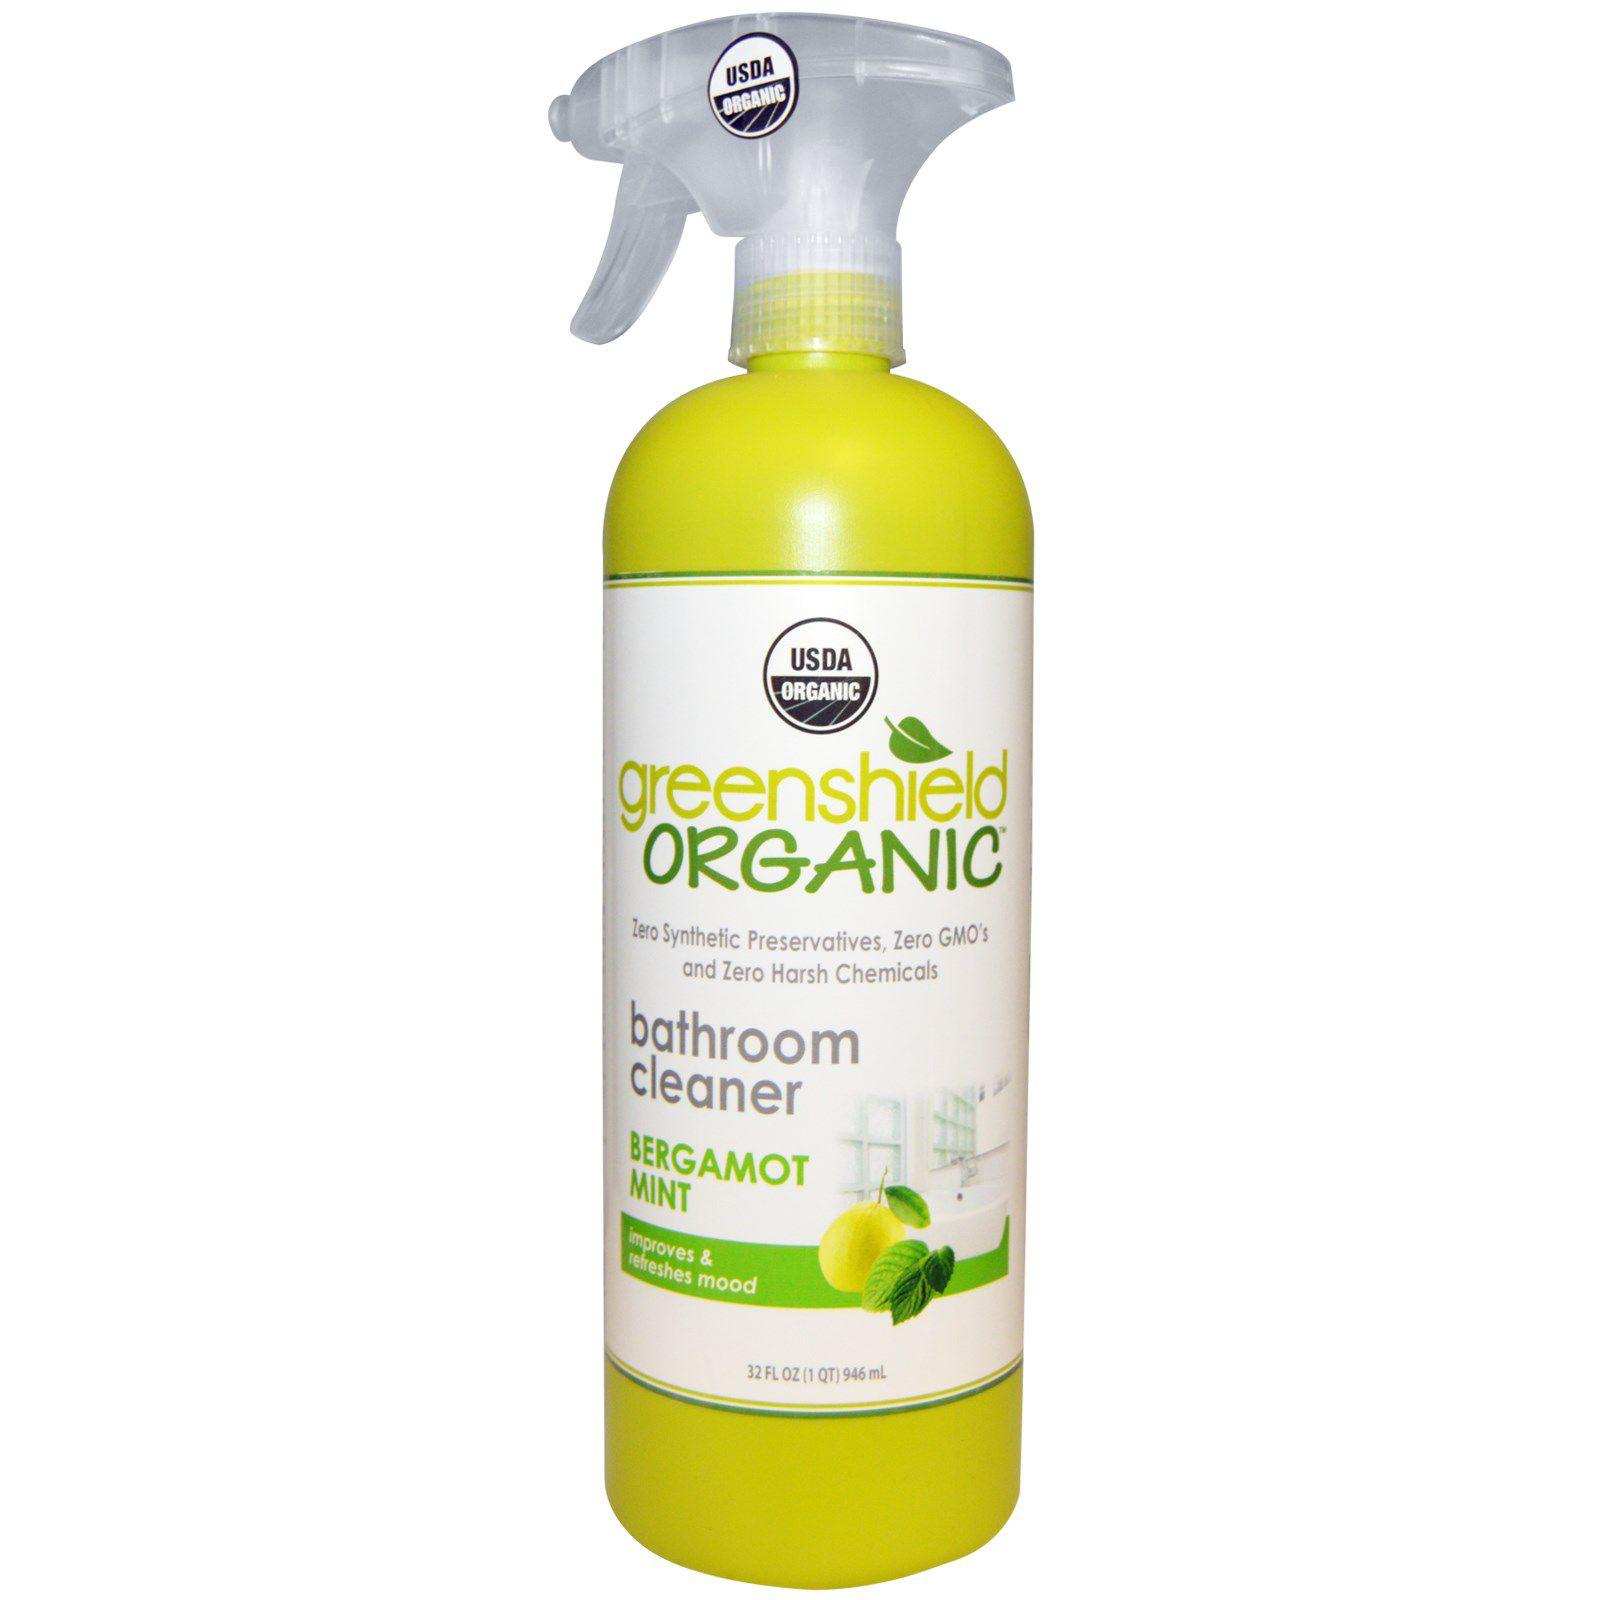 A bottle of Greenshield Organic bathroom cleaner